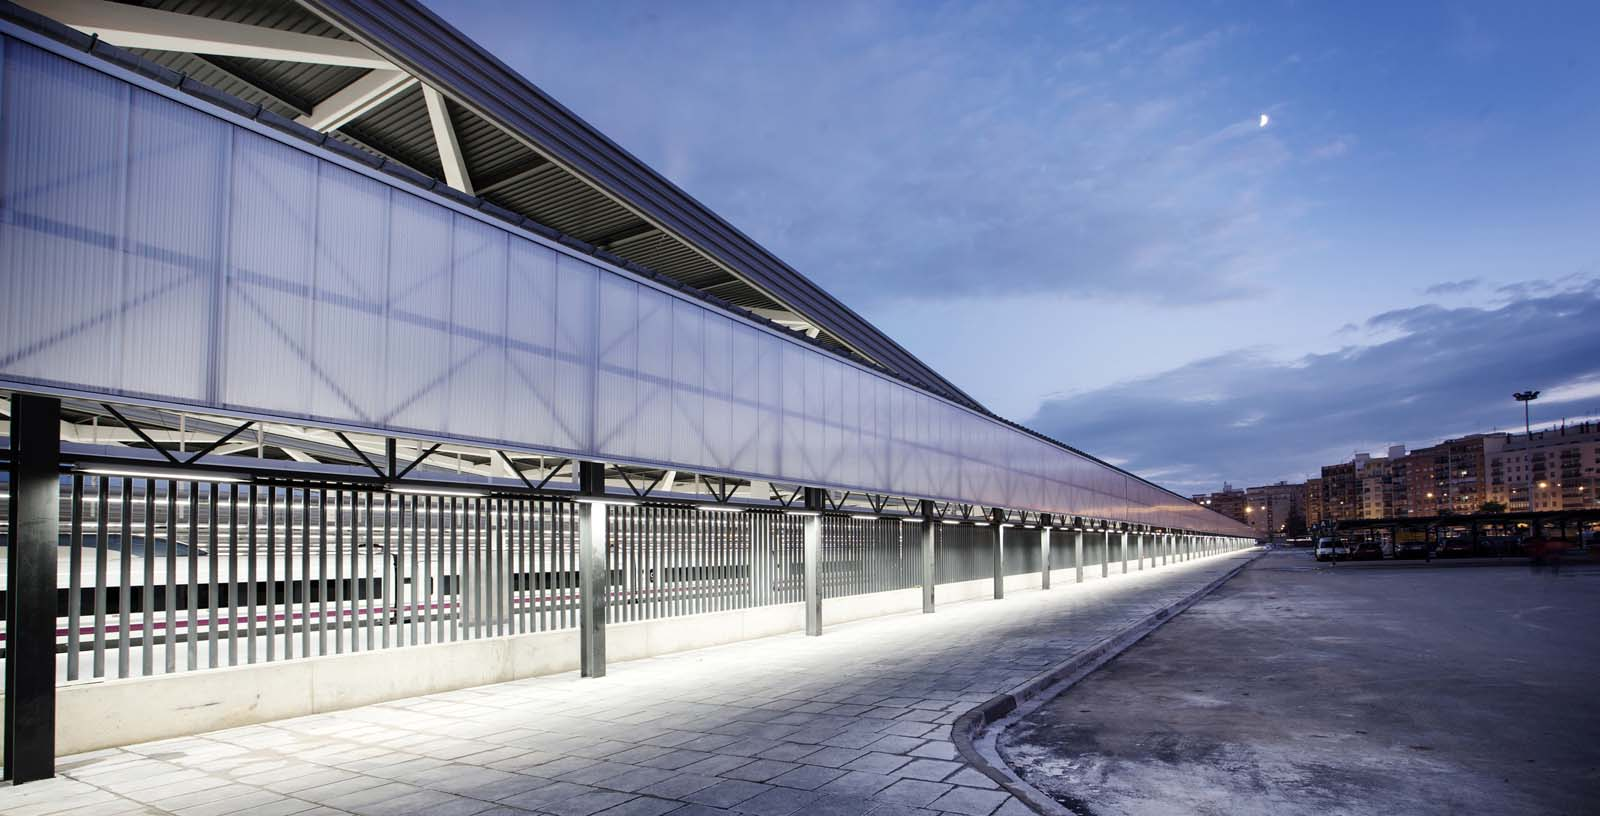 Joaquin_Sorolla_Station_06_Architecture_IDOM_photos_Alfonso_Calza